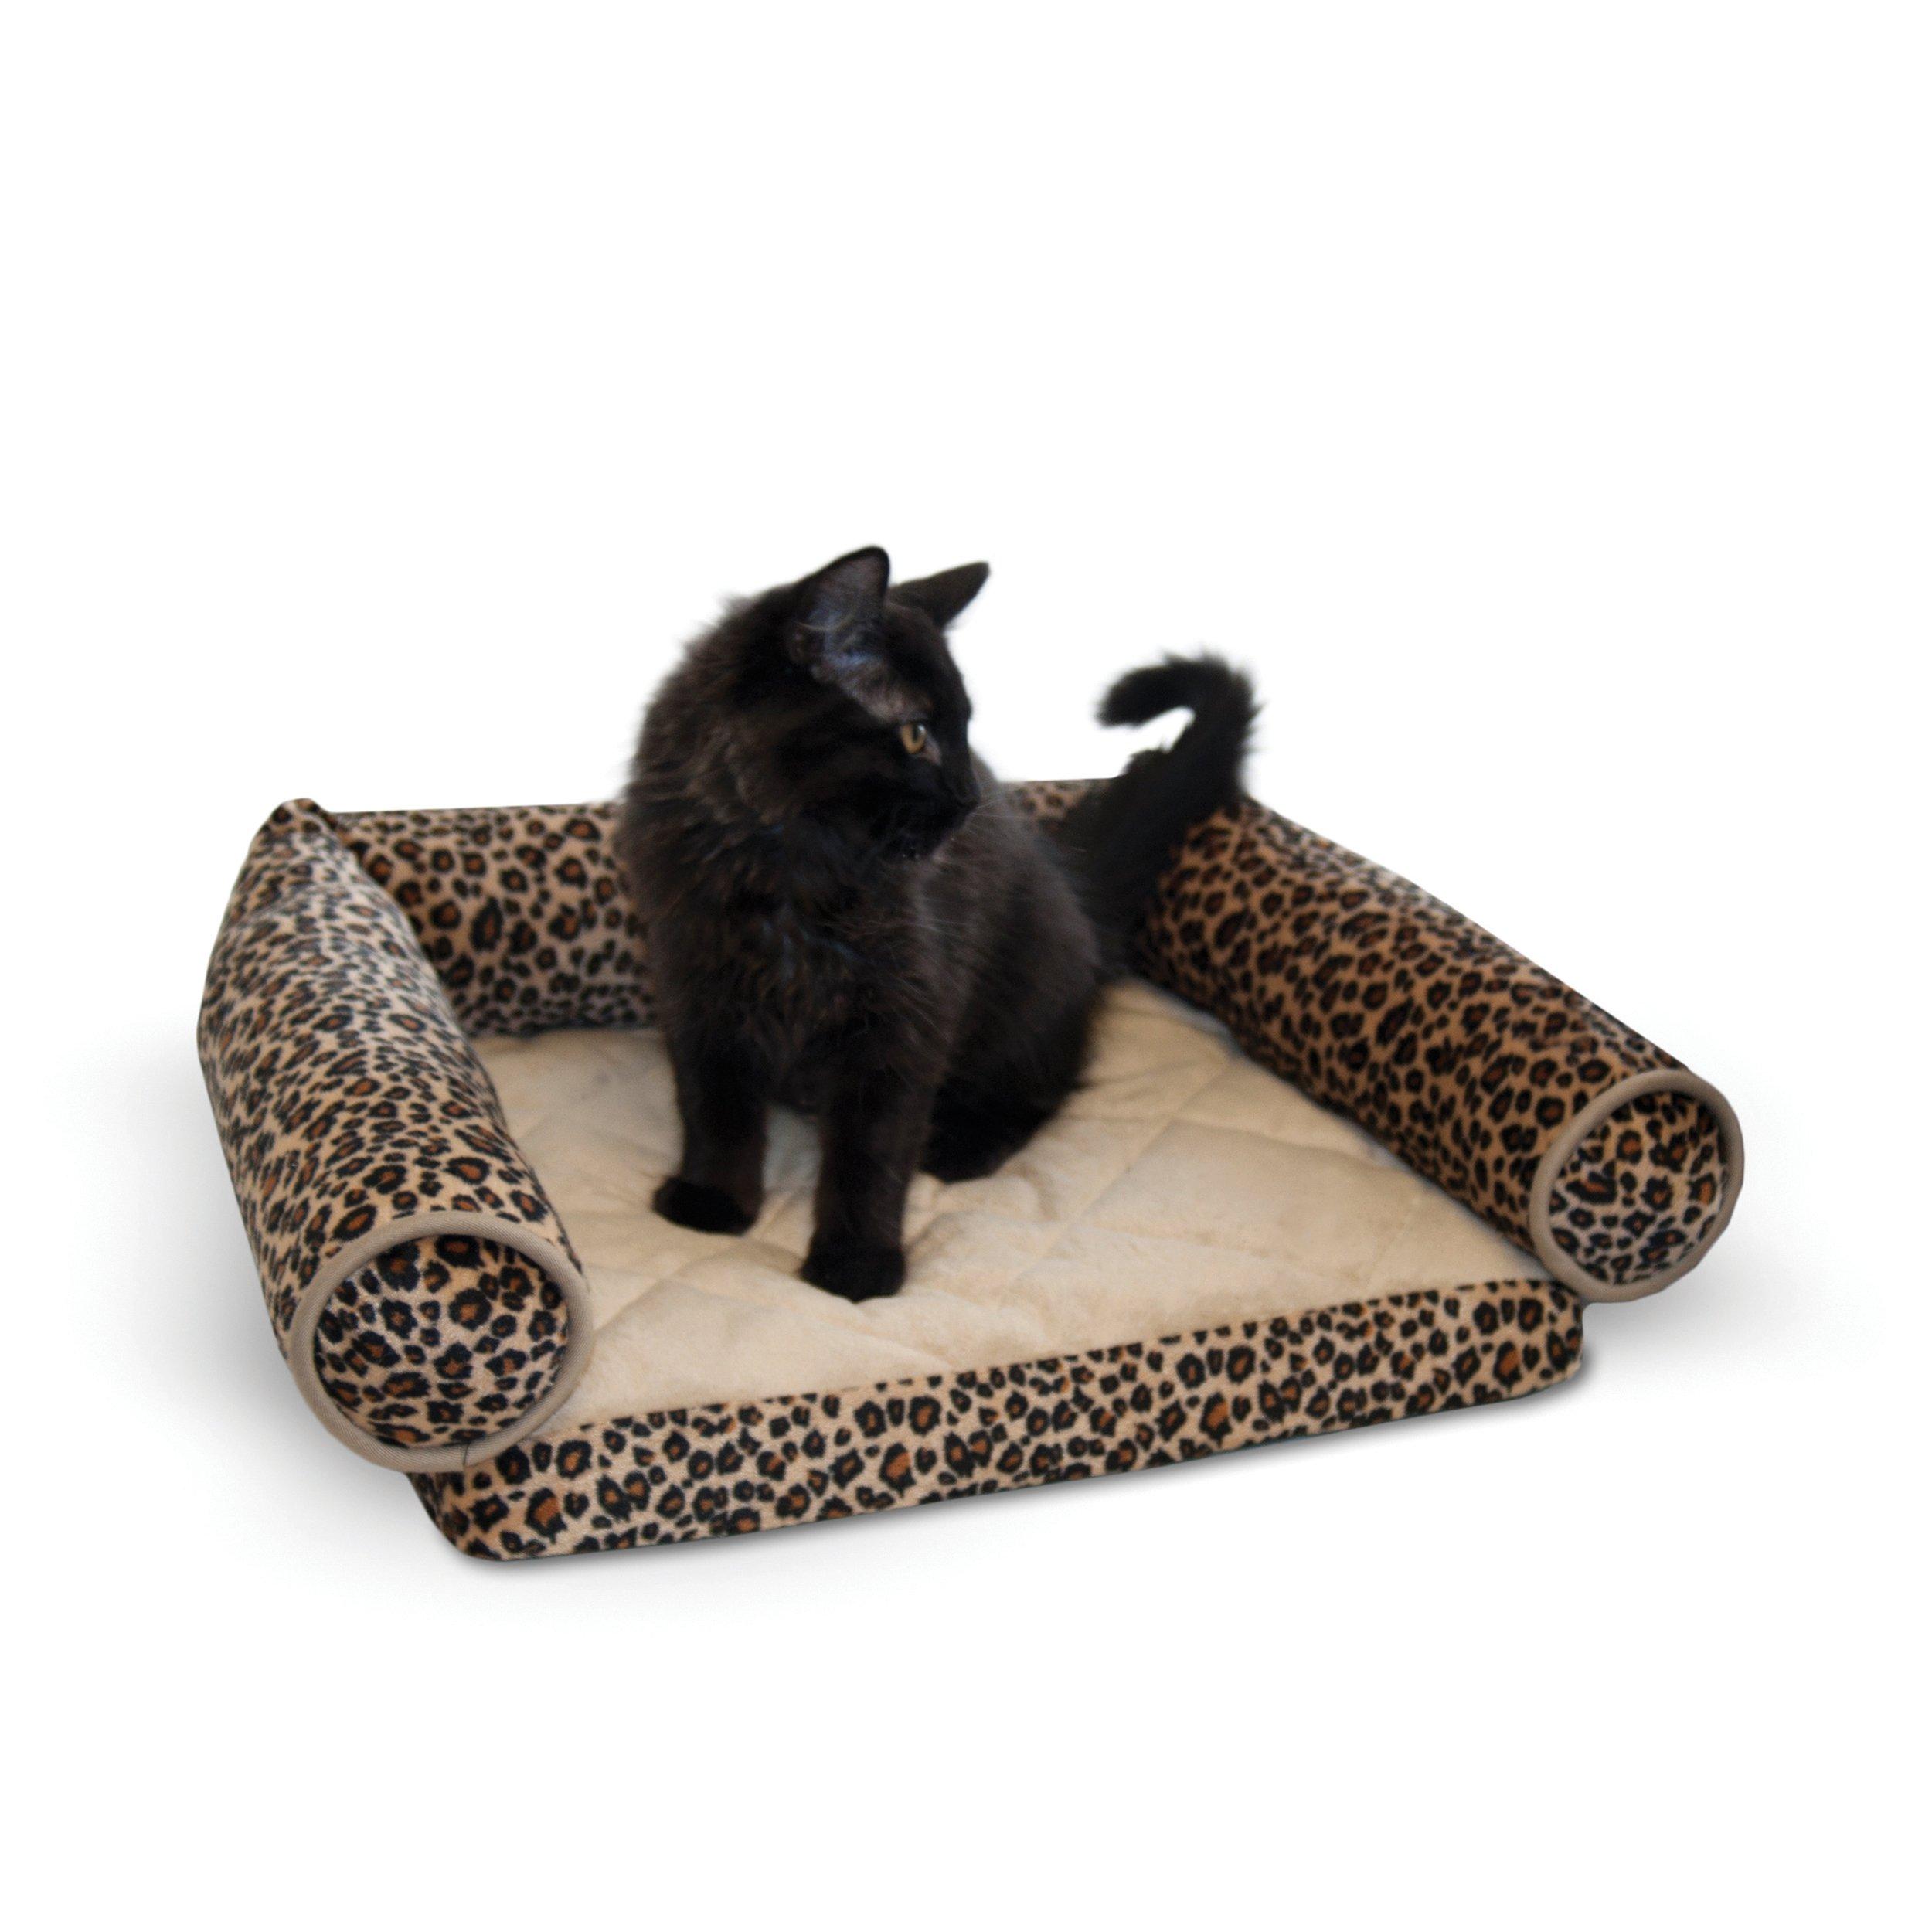 K&H Pet Products Lazy Lounger Pet Bed Leopard 14'' x 16''